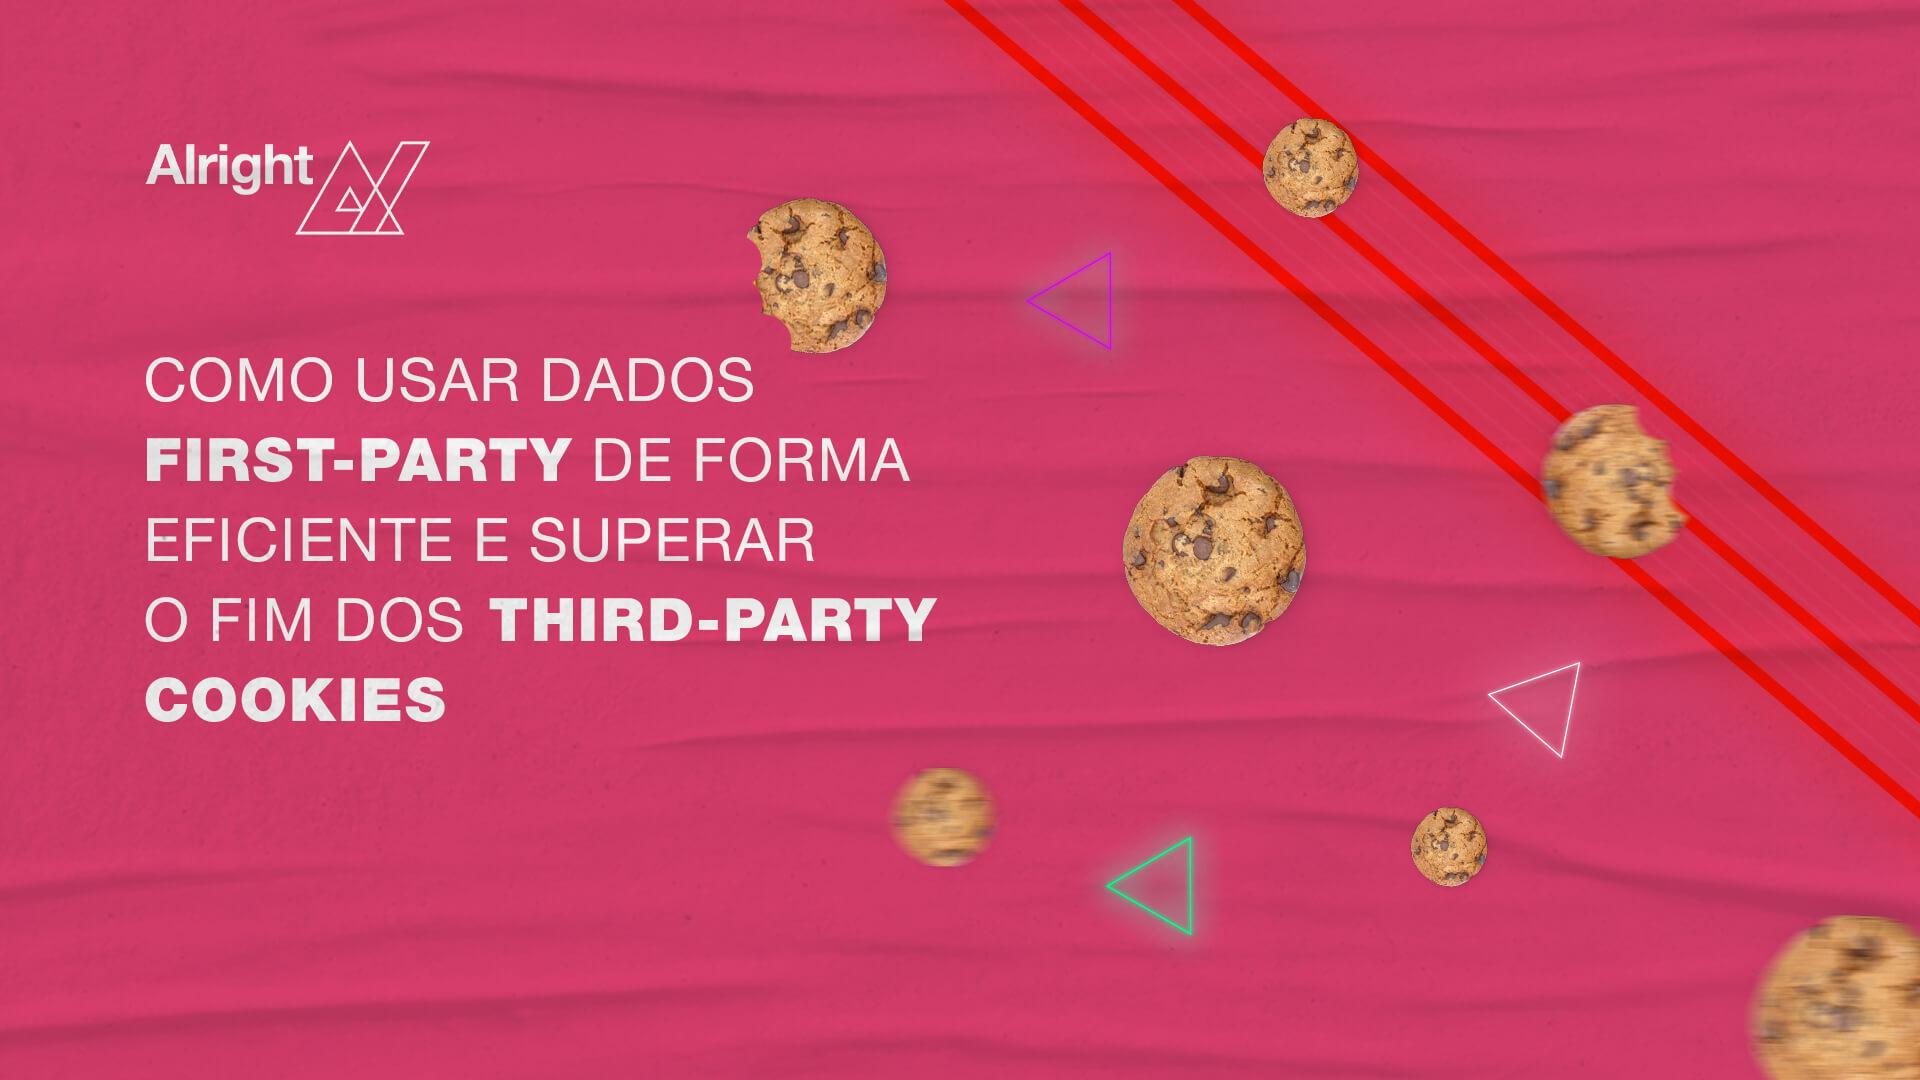 Alright | Como usar dados first-party de forma eficiente e superar o fim dos third-party cookies